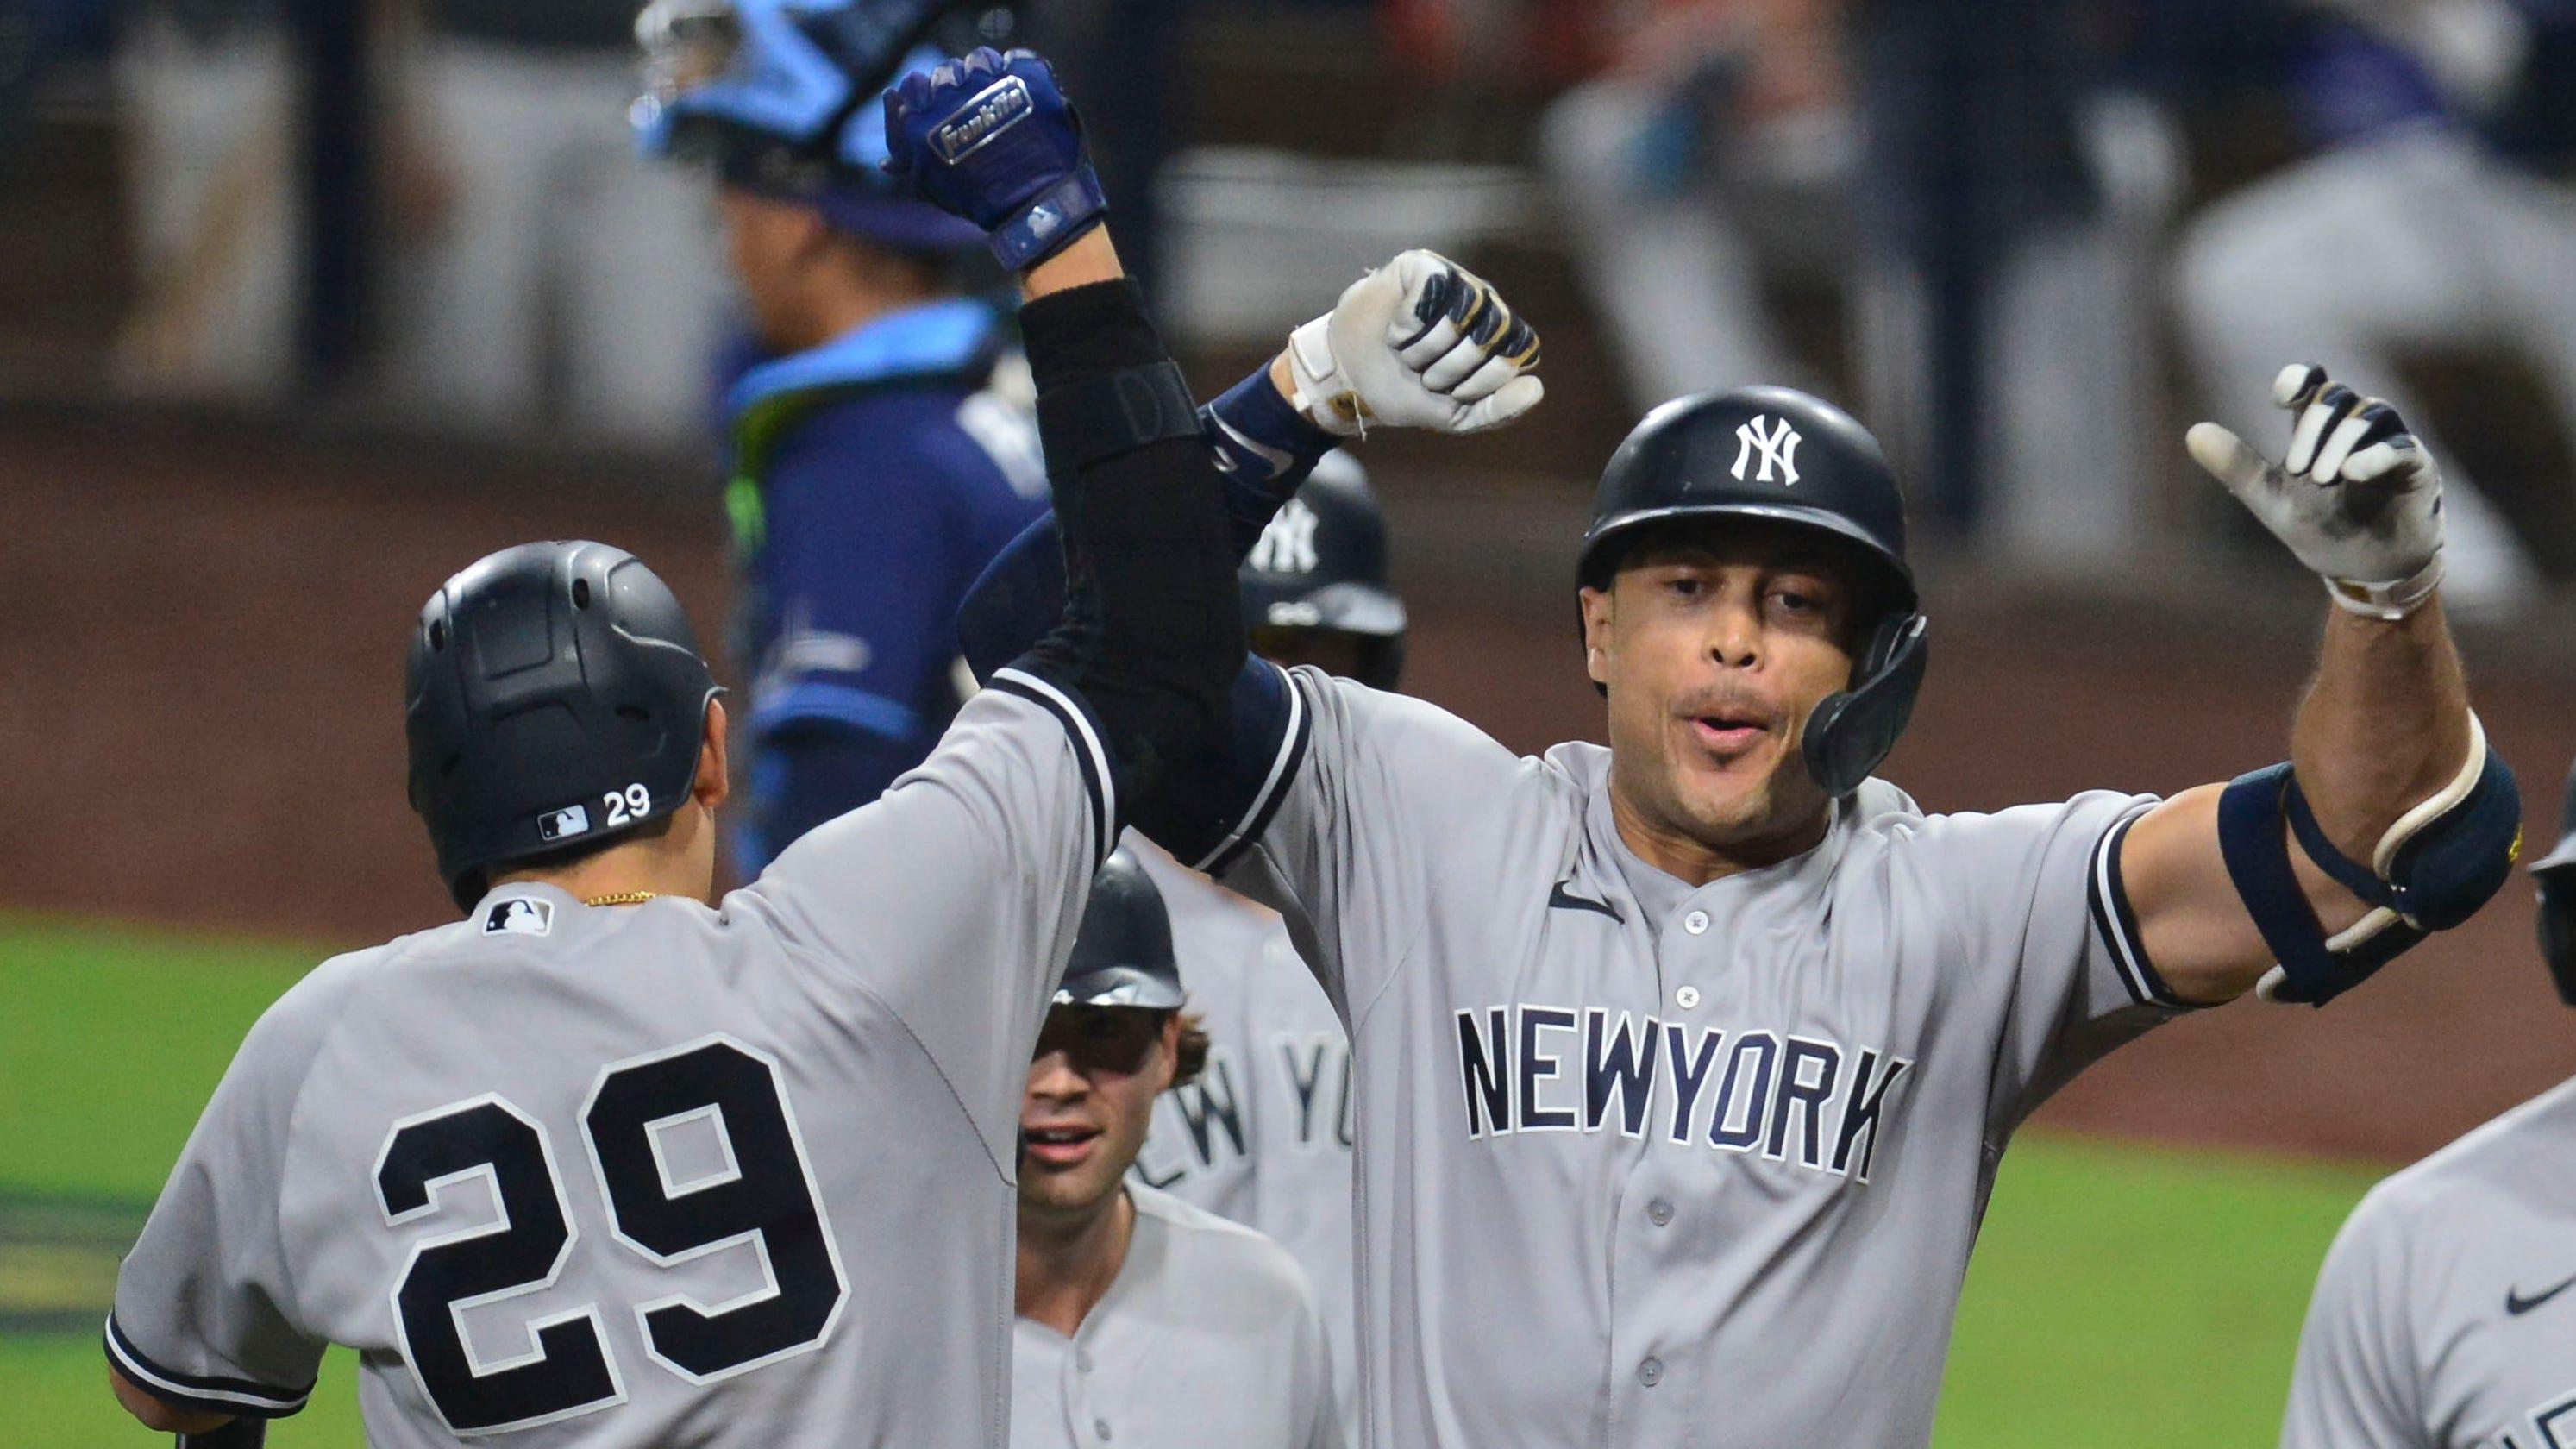 Yankees' Giancarlo Stanton, Aaron Judge are back slugging